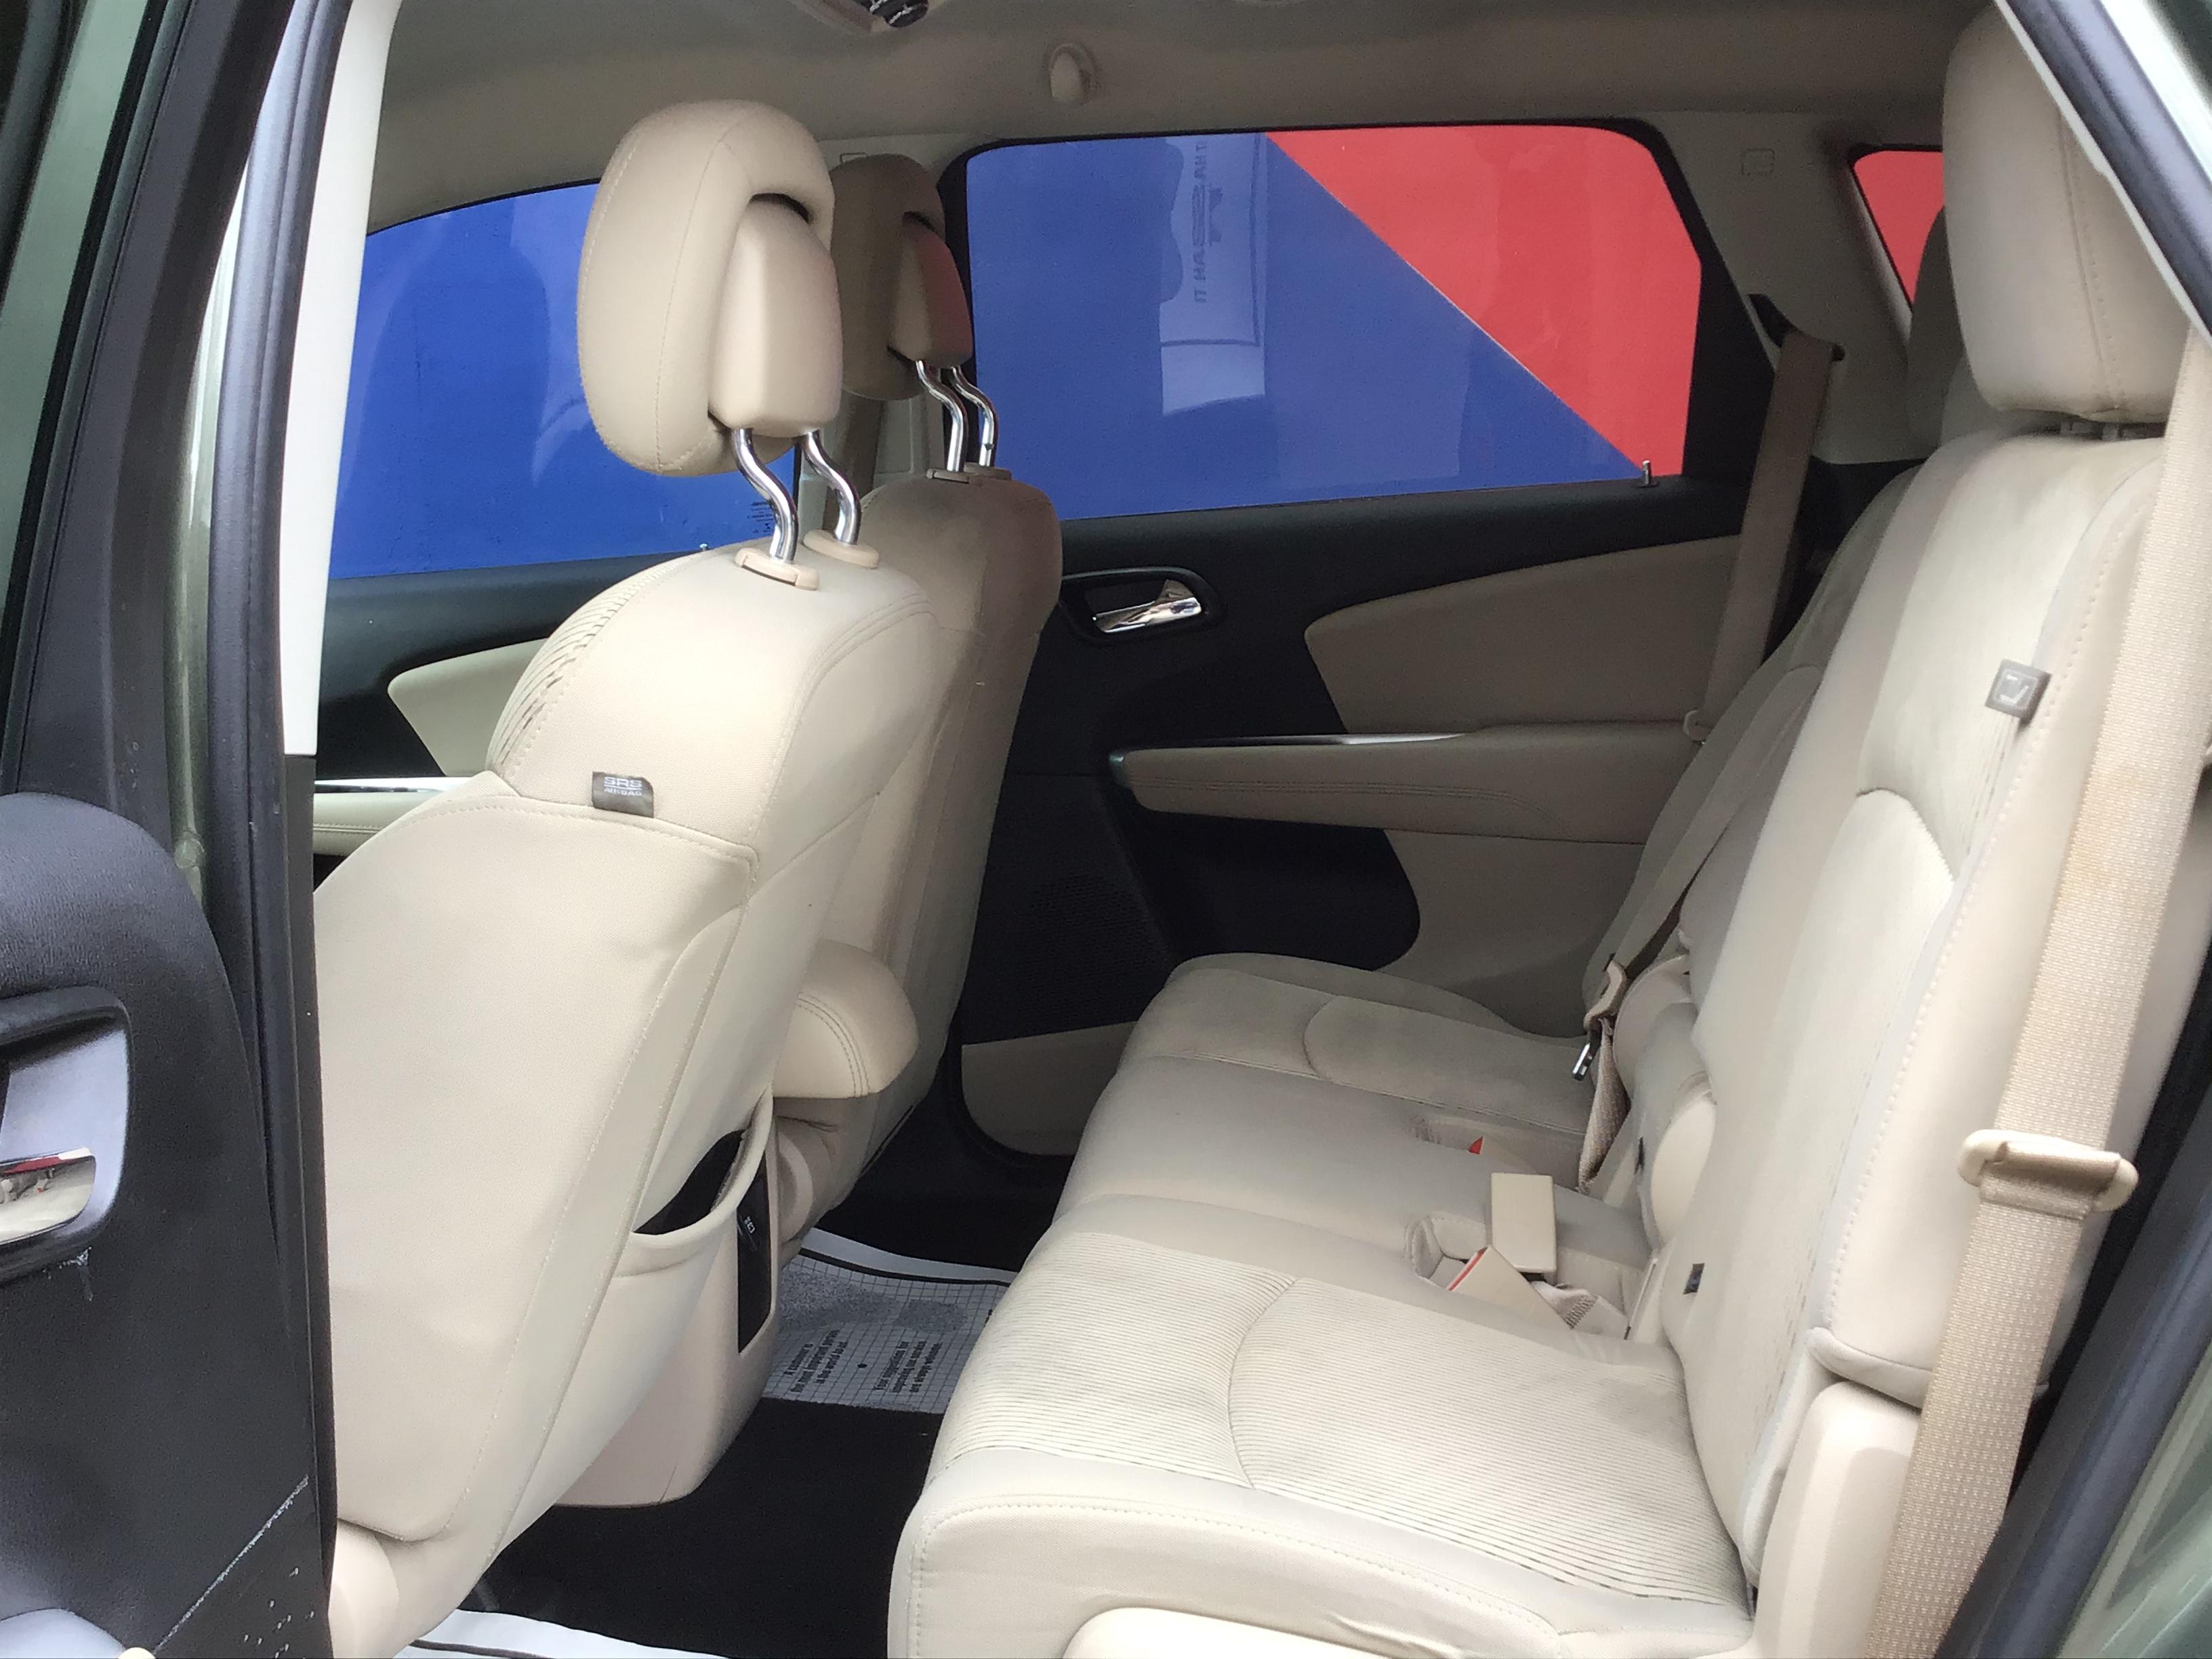 used vehicle - SUV DODGE JOURNEY 2016